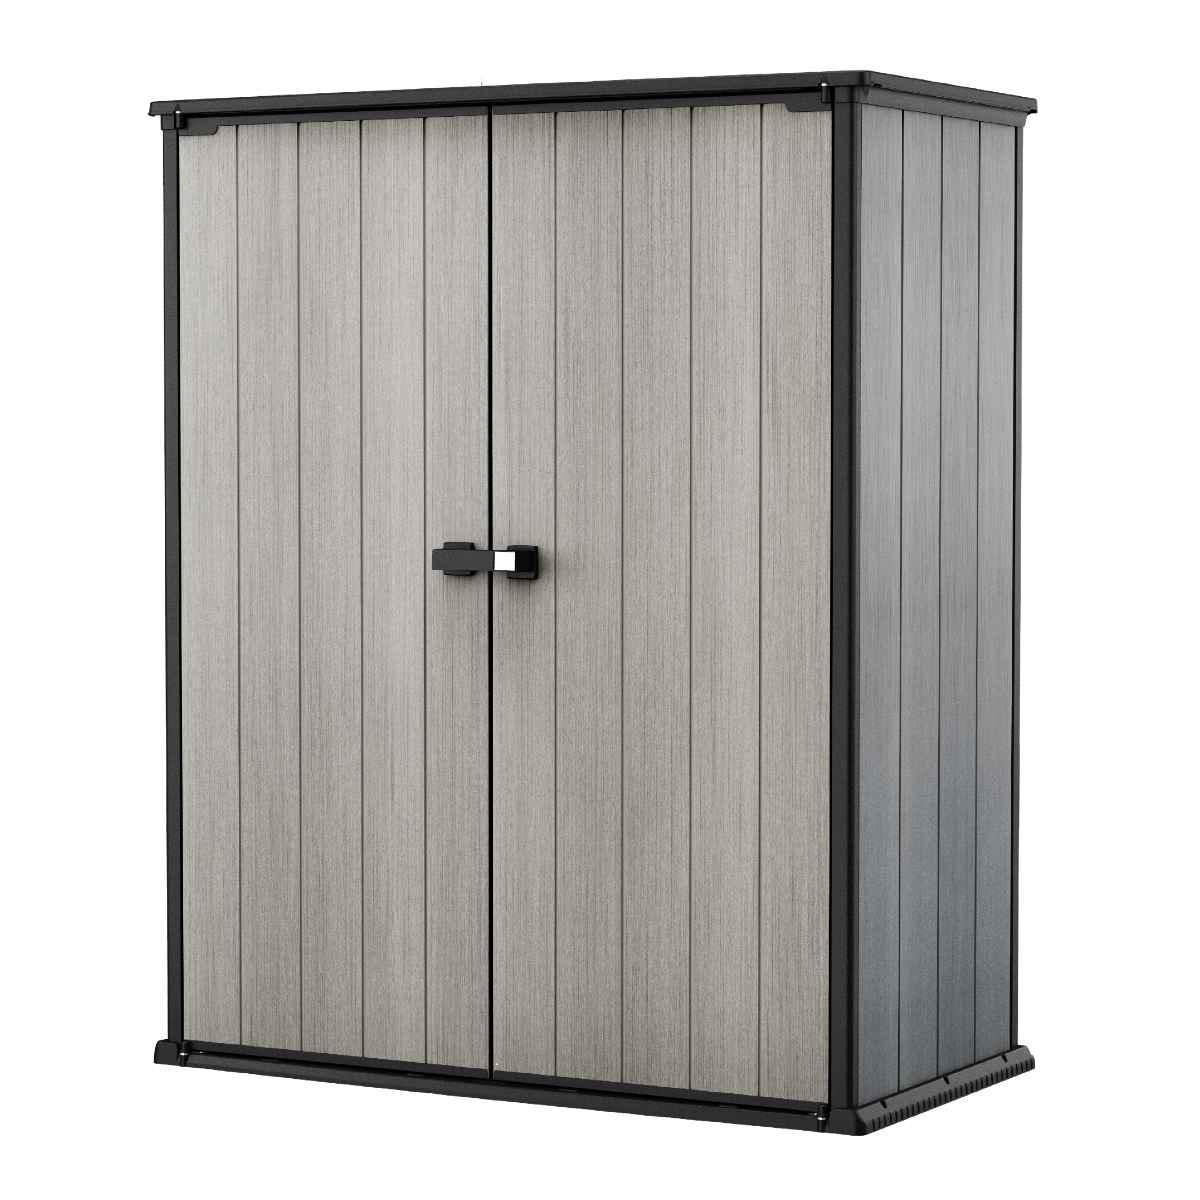 Keter Hi-Store Plus Storage Box - Grey